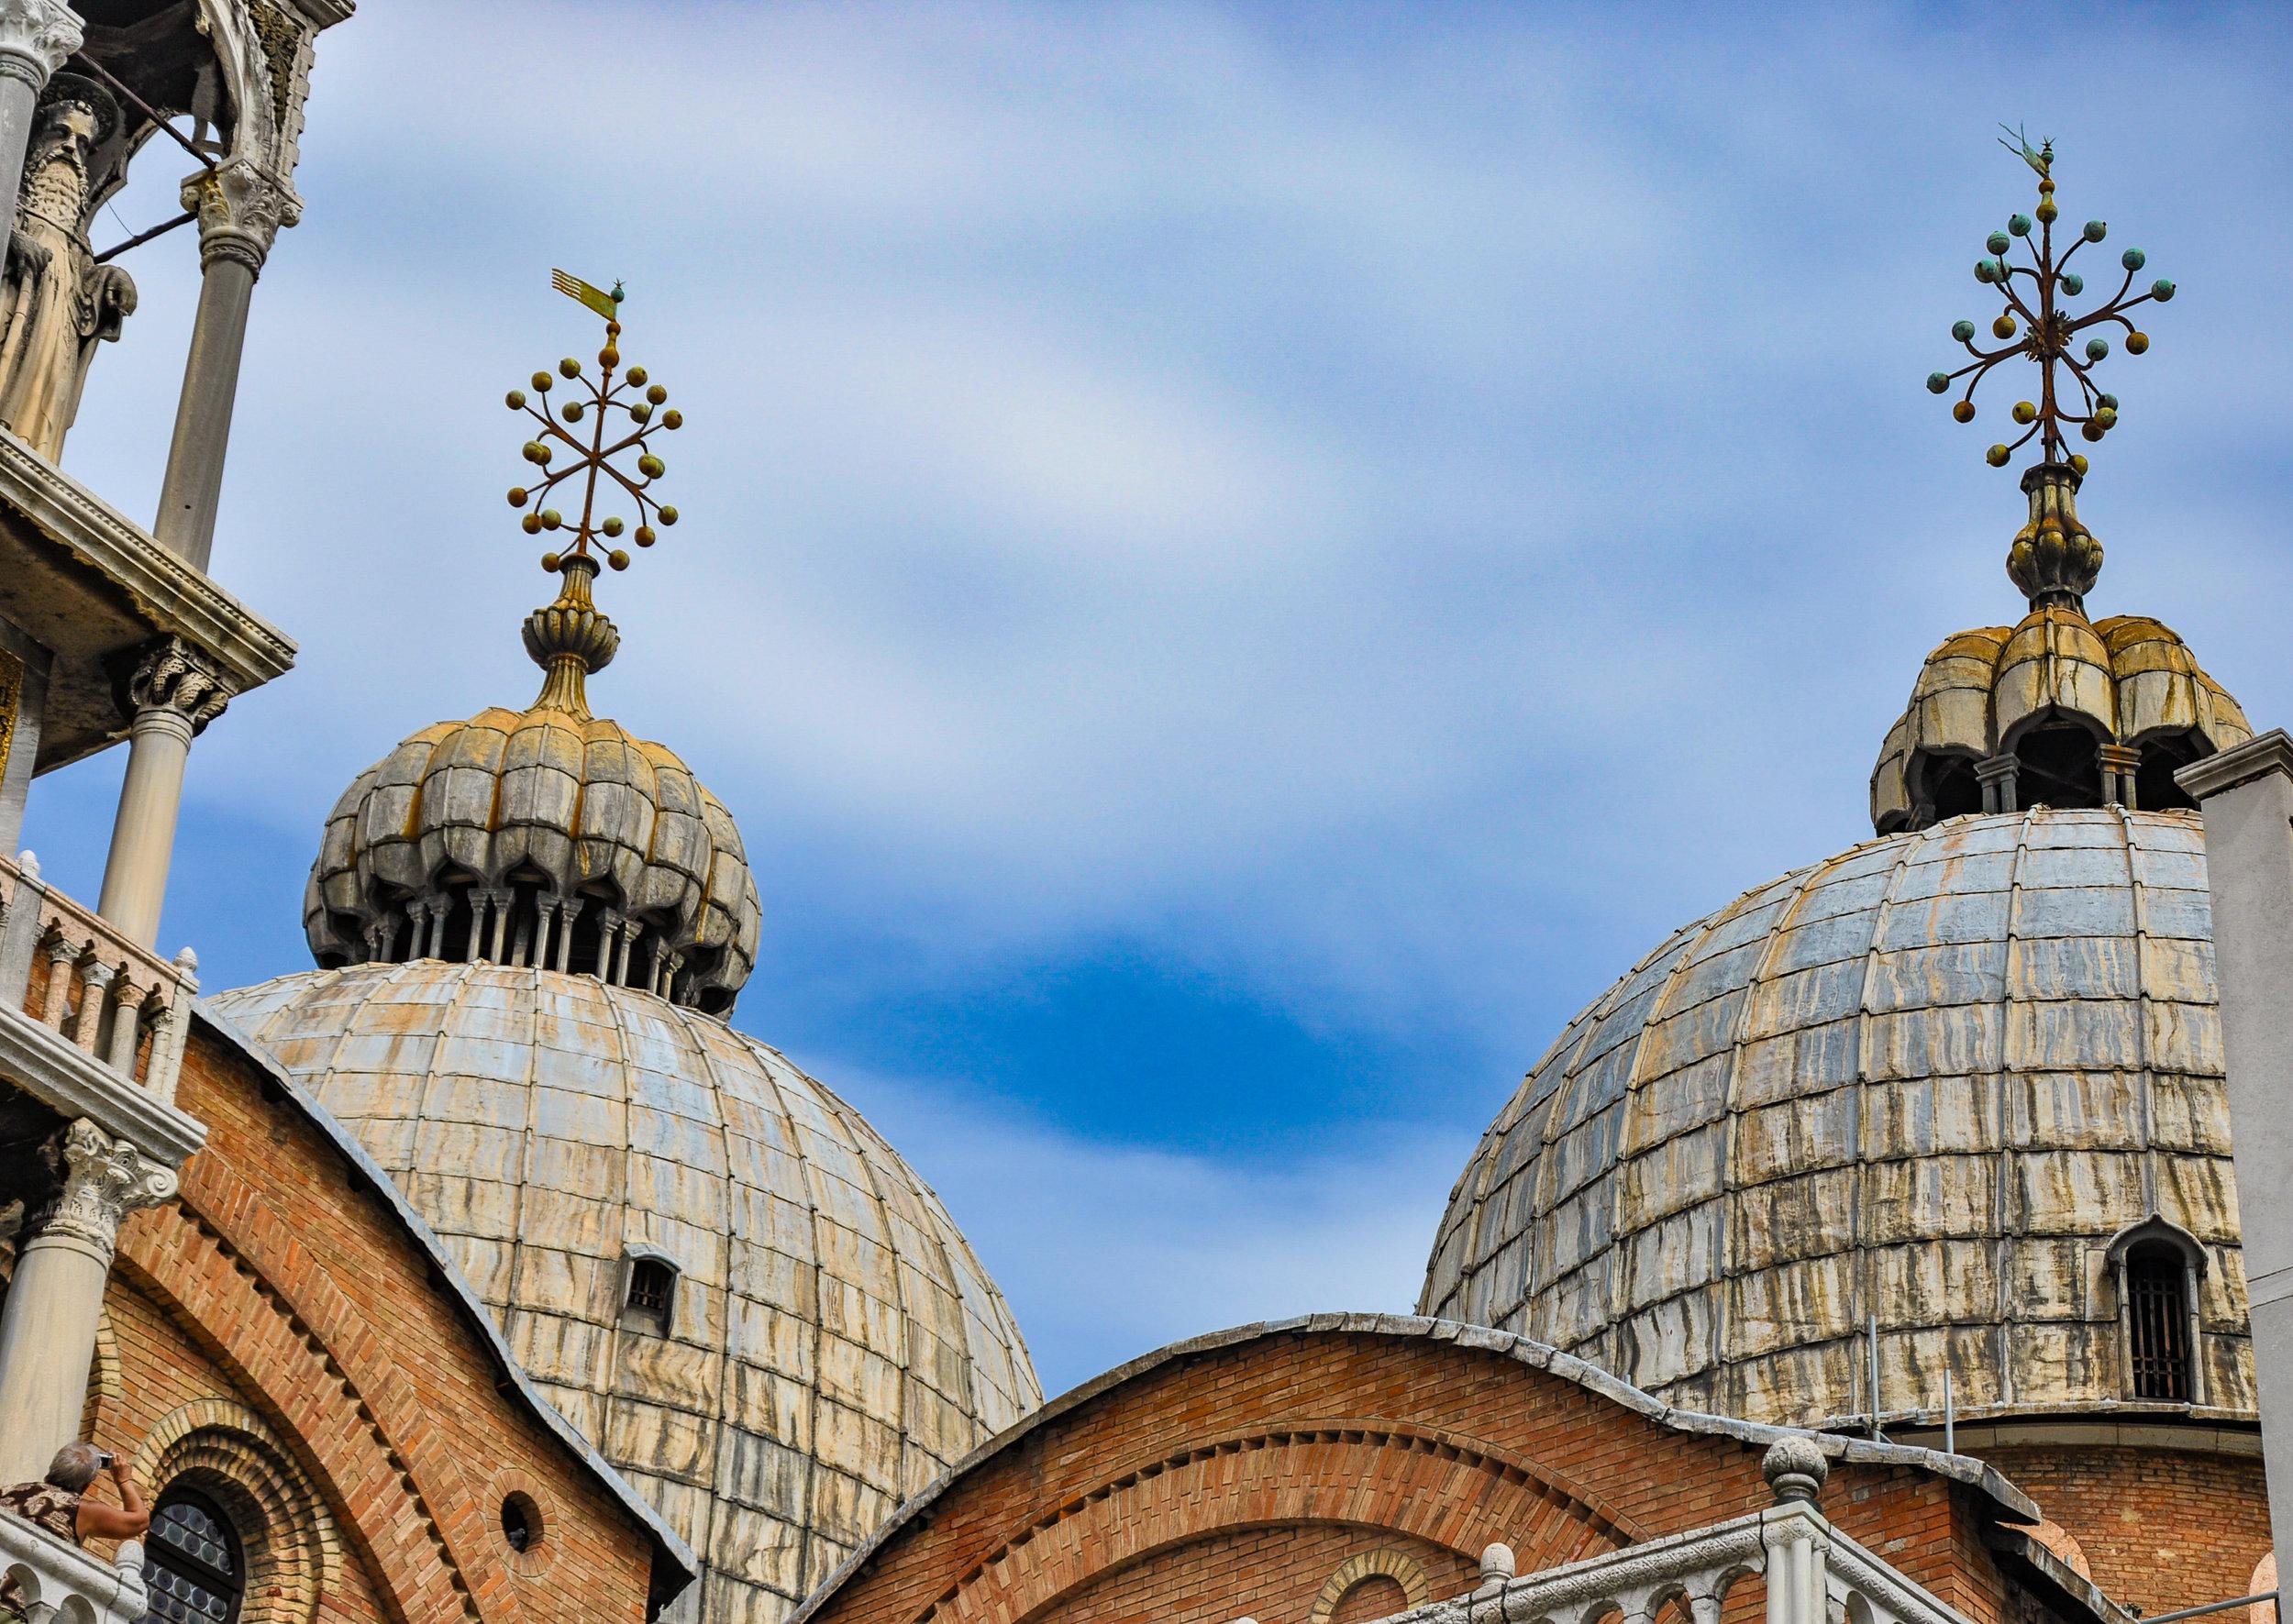 View my Venice, Verona and Florence Album